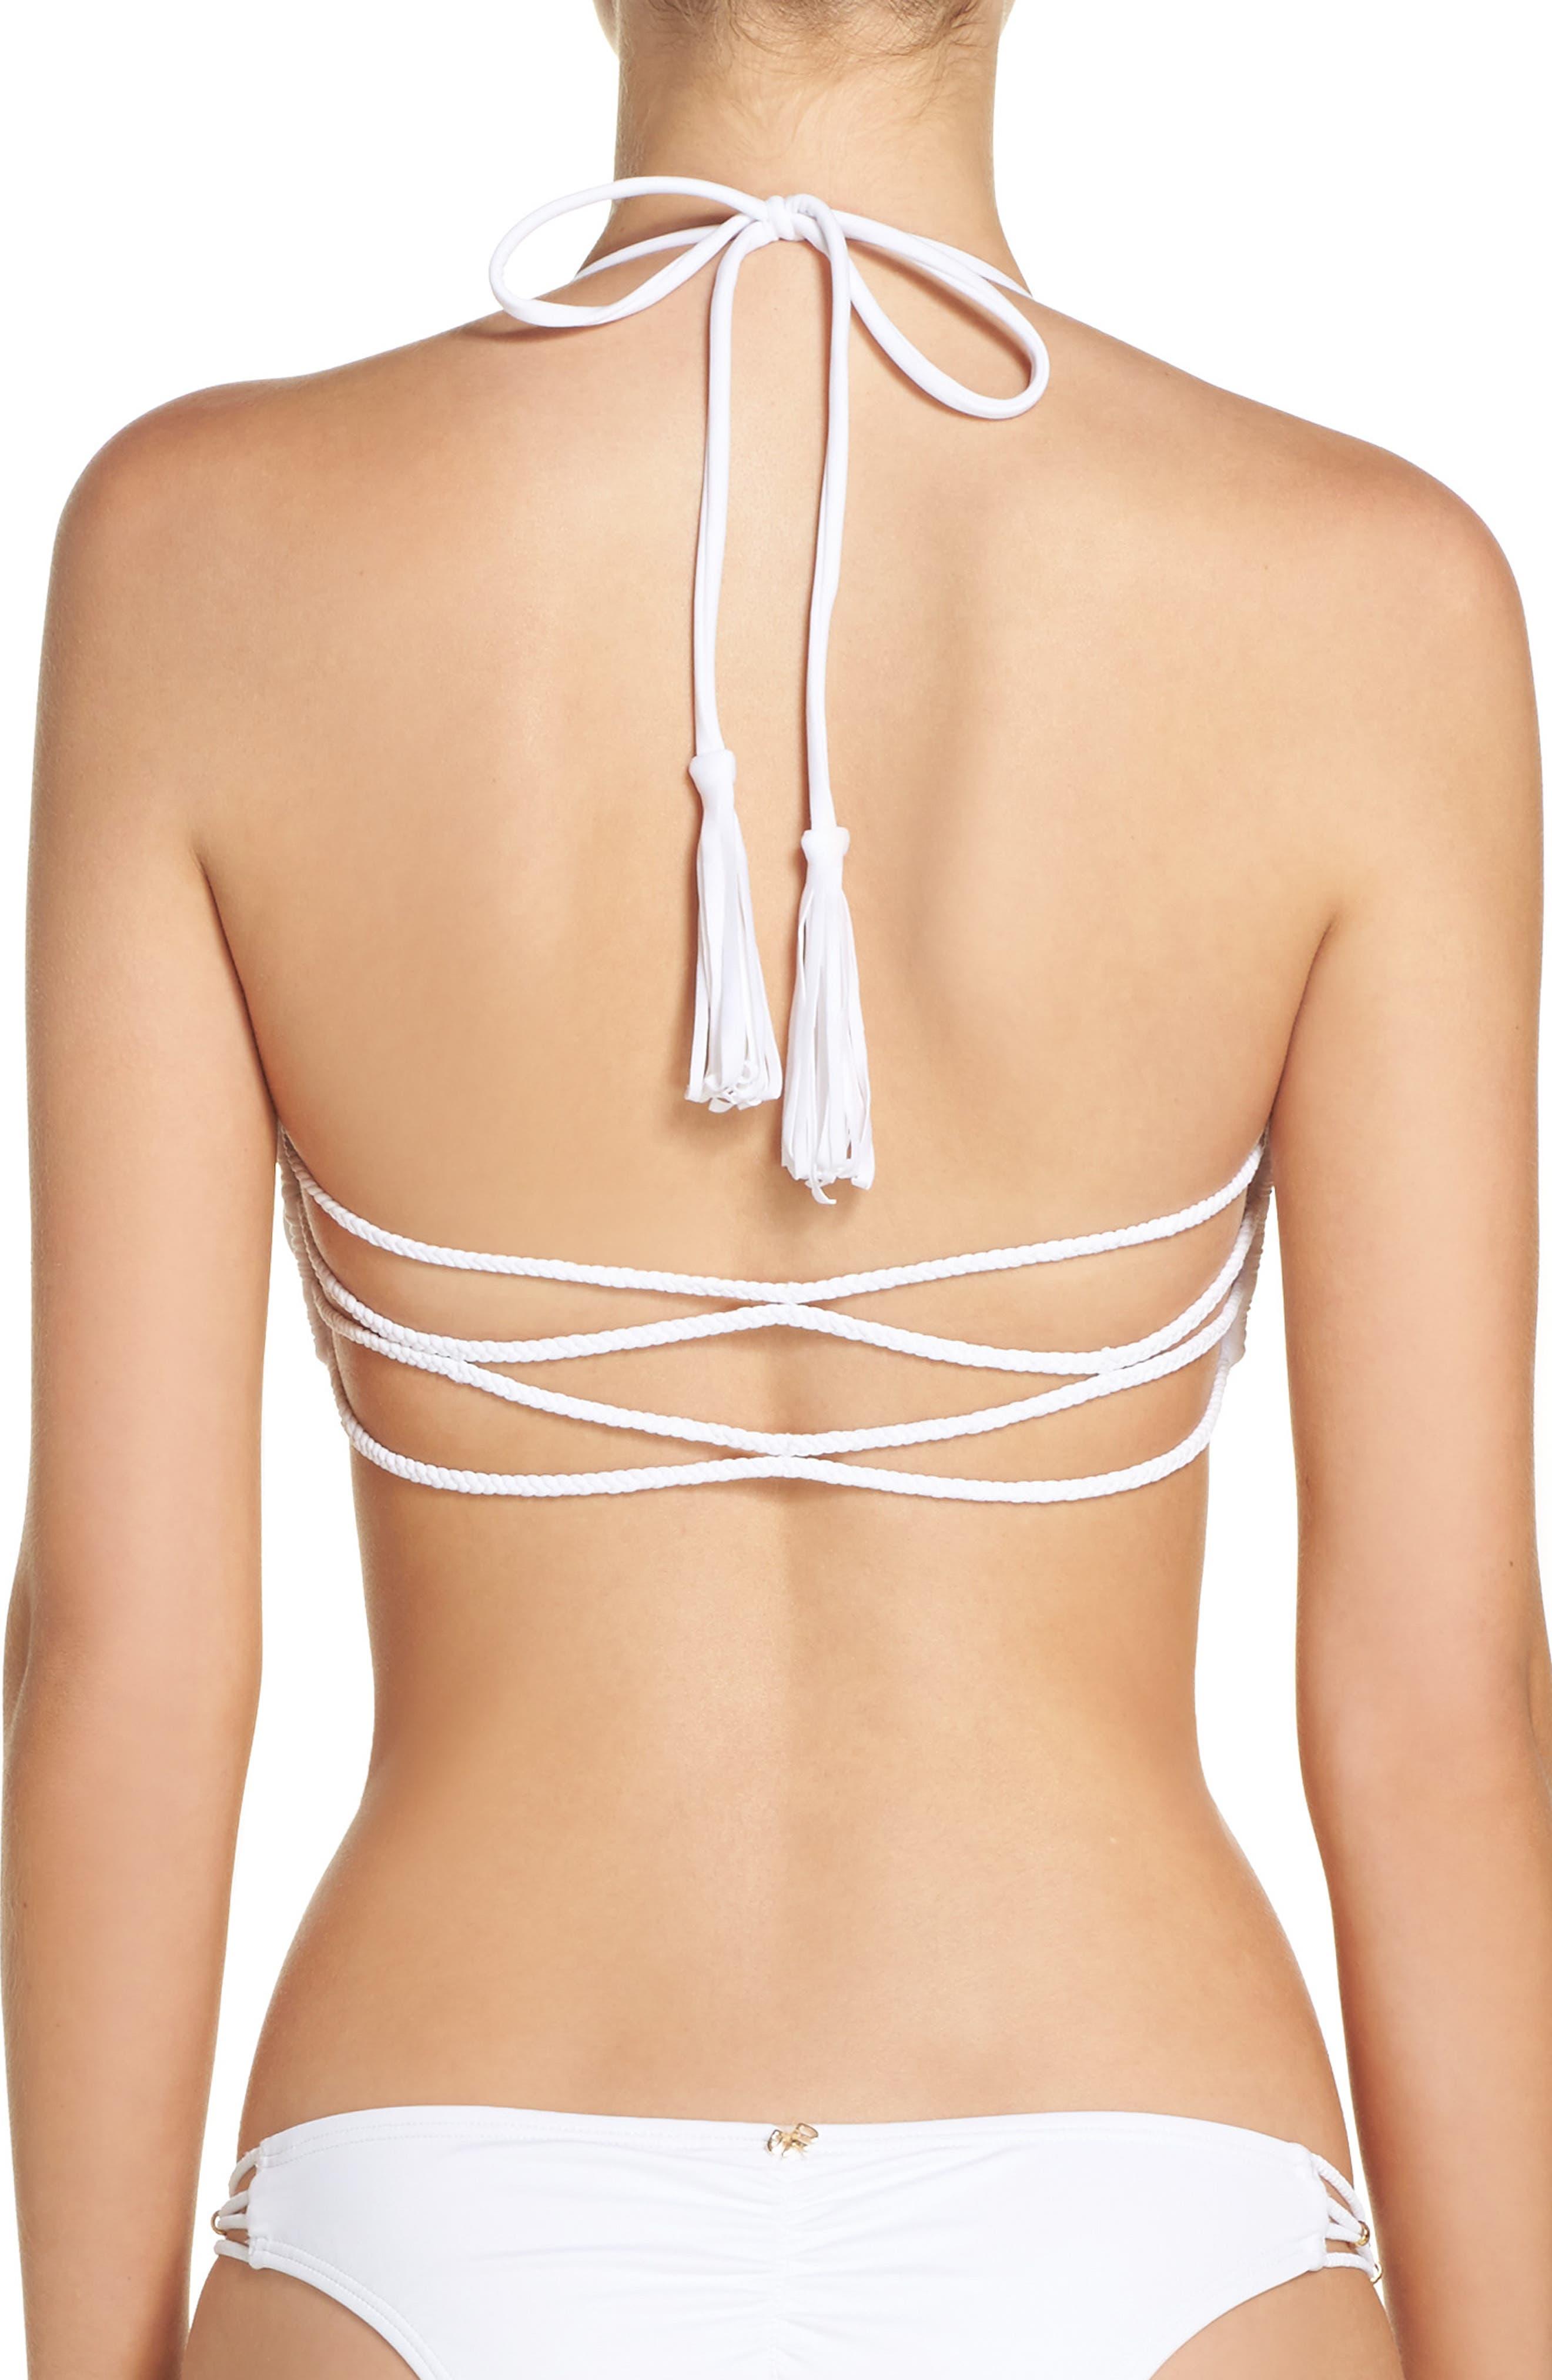 Braided Halter Bikini Top,                             Alternate thumbnail 2, color,                             100